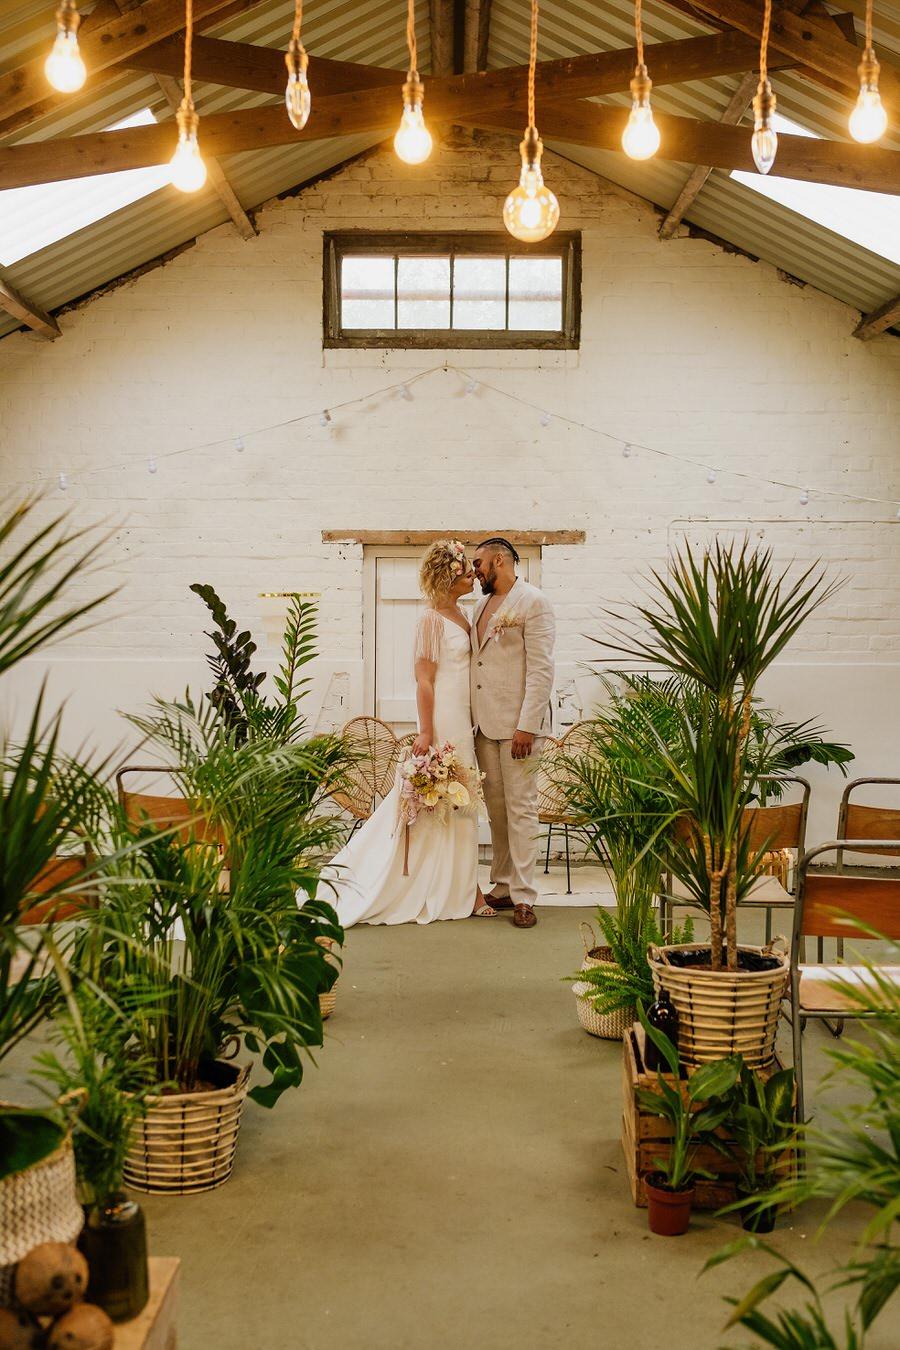 Free spirited modern jungle wedding inspiration at White Syke Fields, image credit Jenna Kathleen Photography (11)